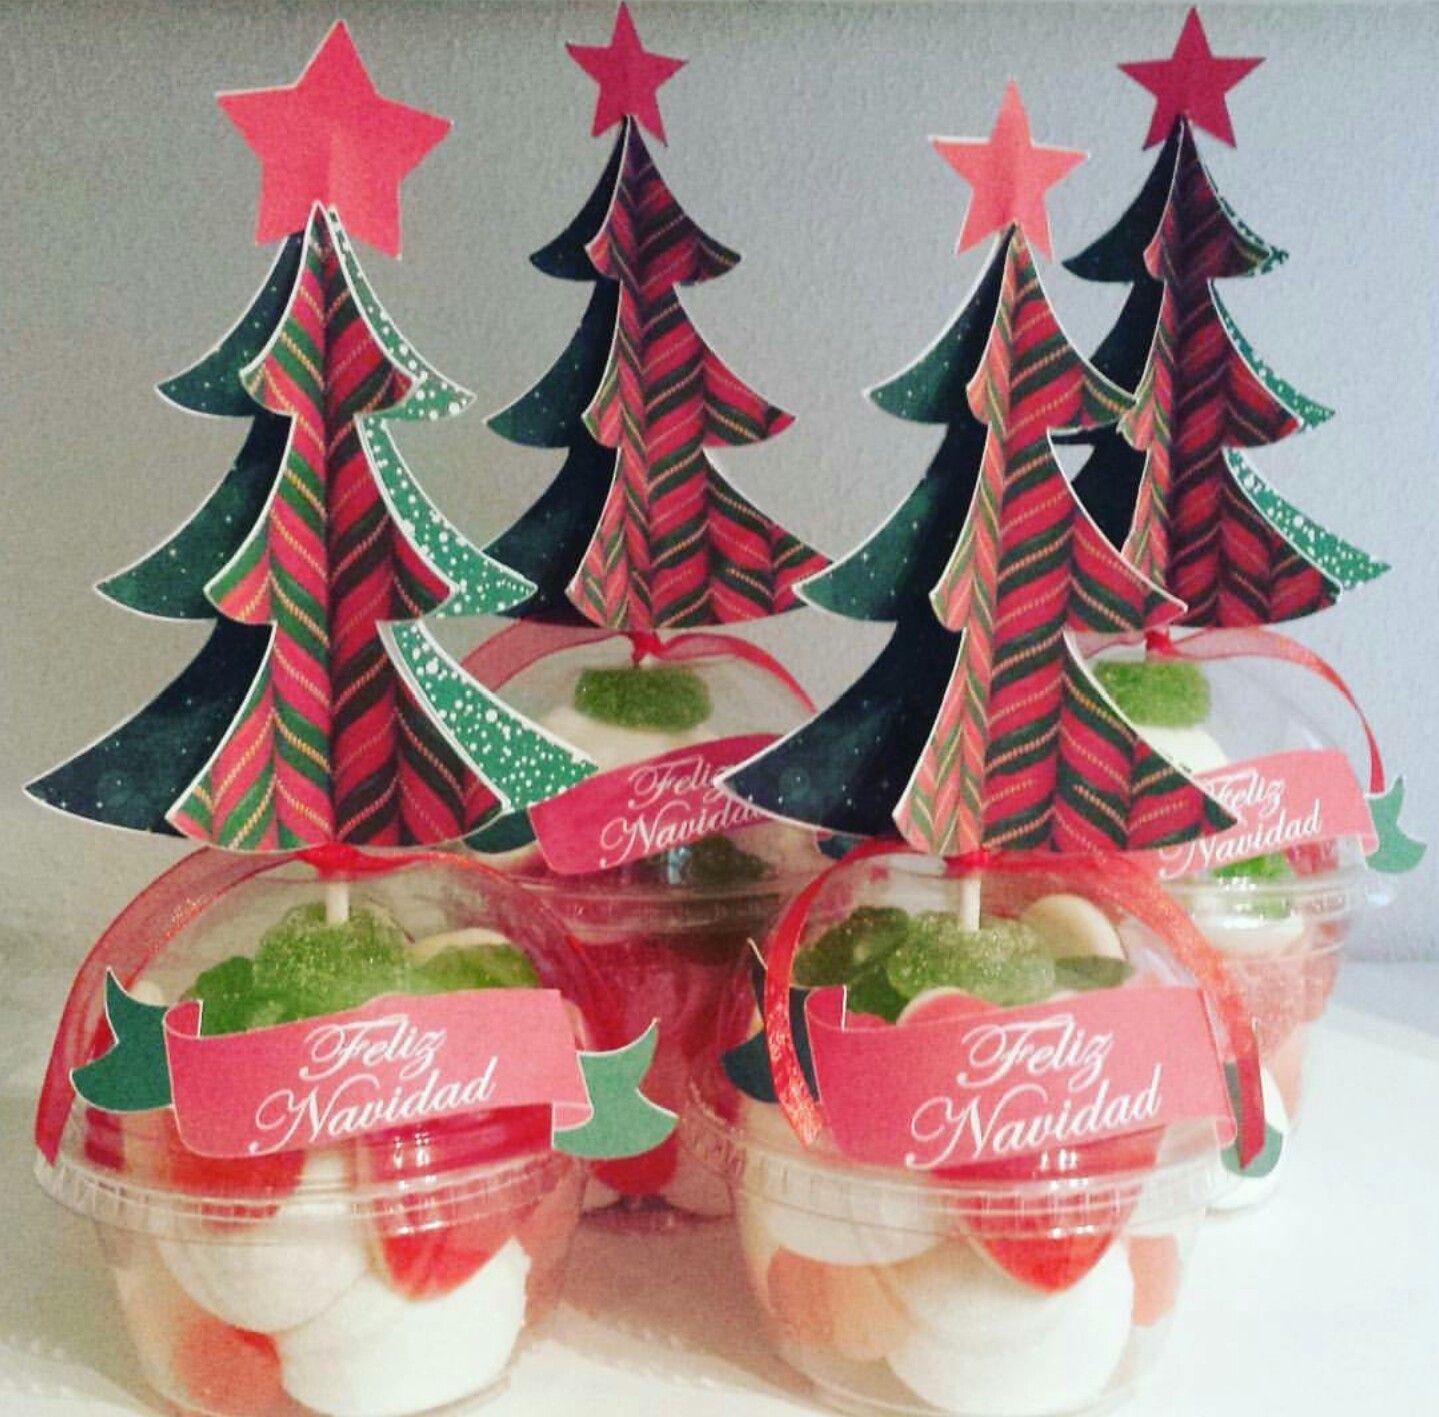 Vasitos de chuches con topper hecho a mano navidad - Regalos navidenos hechos a mano ...